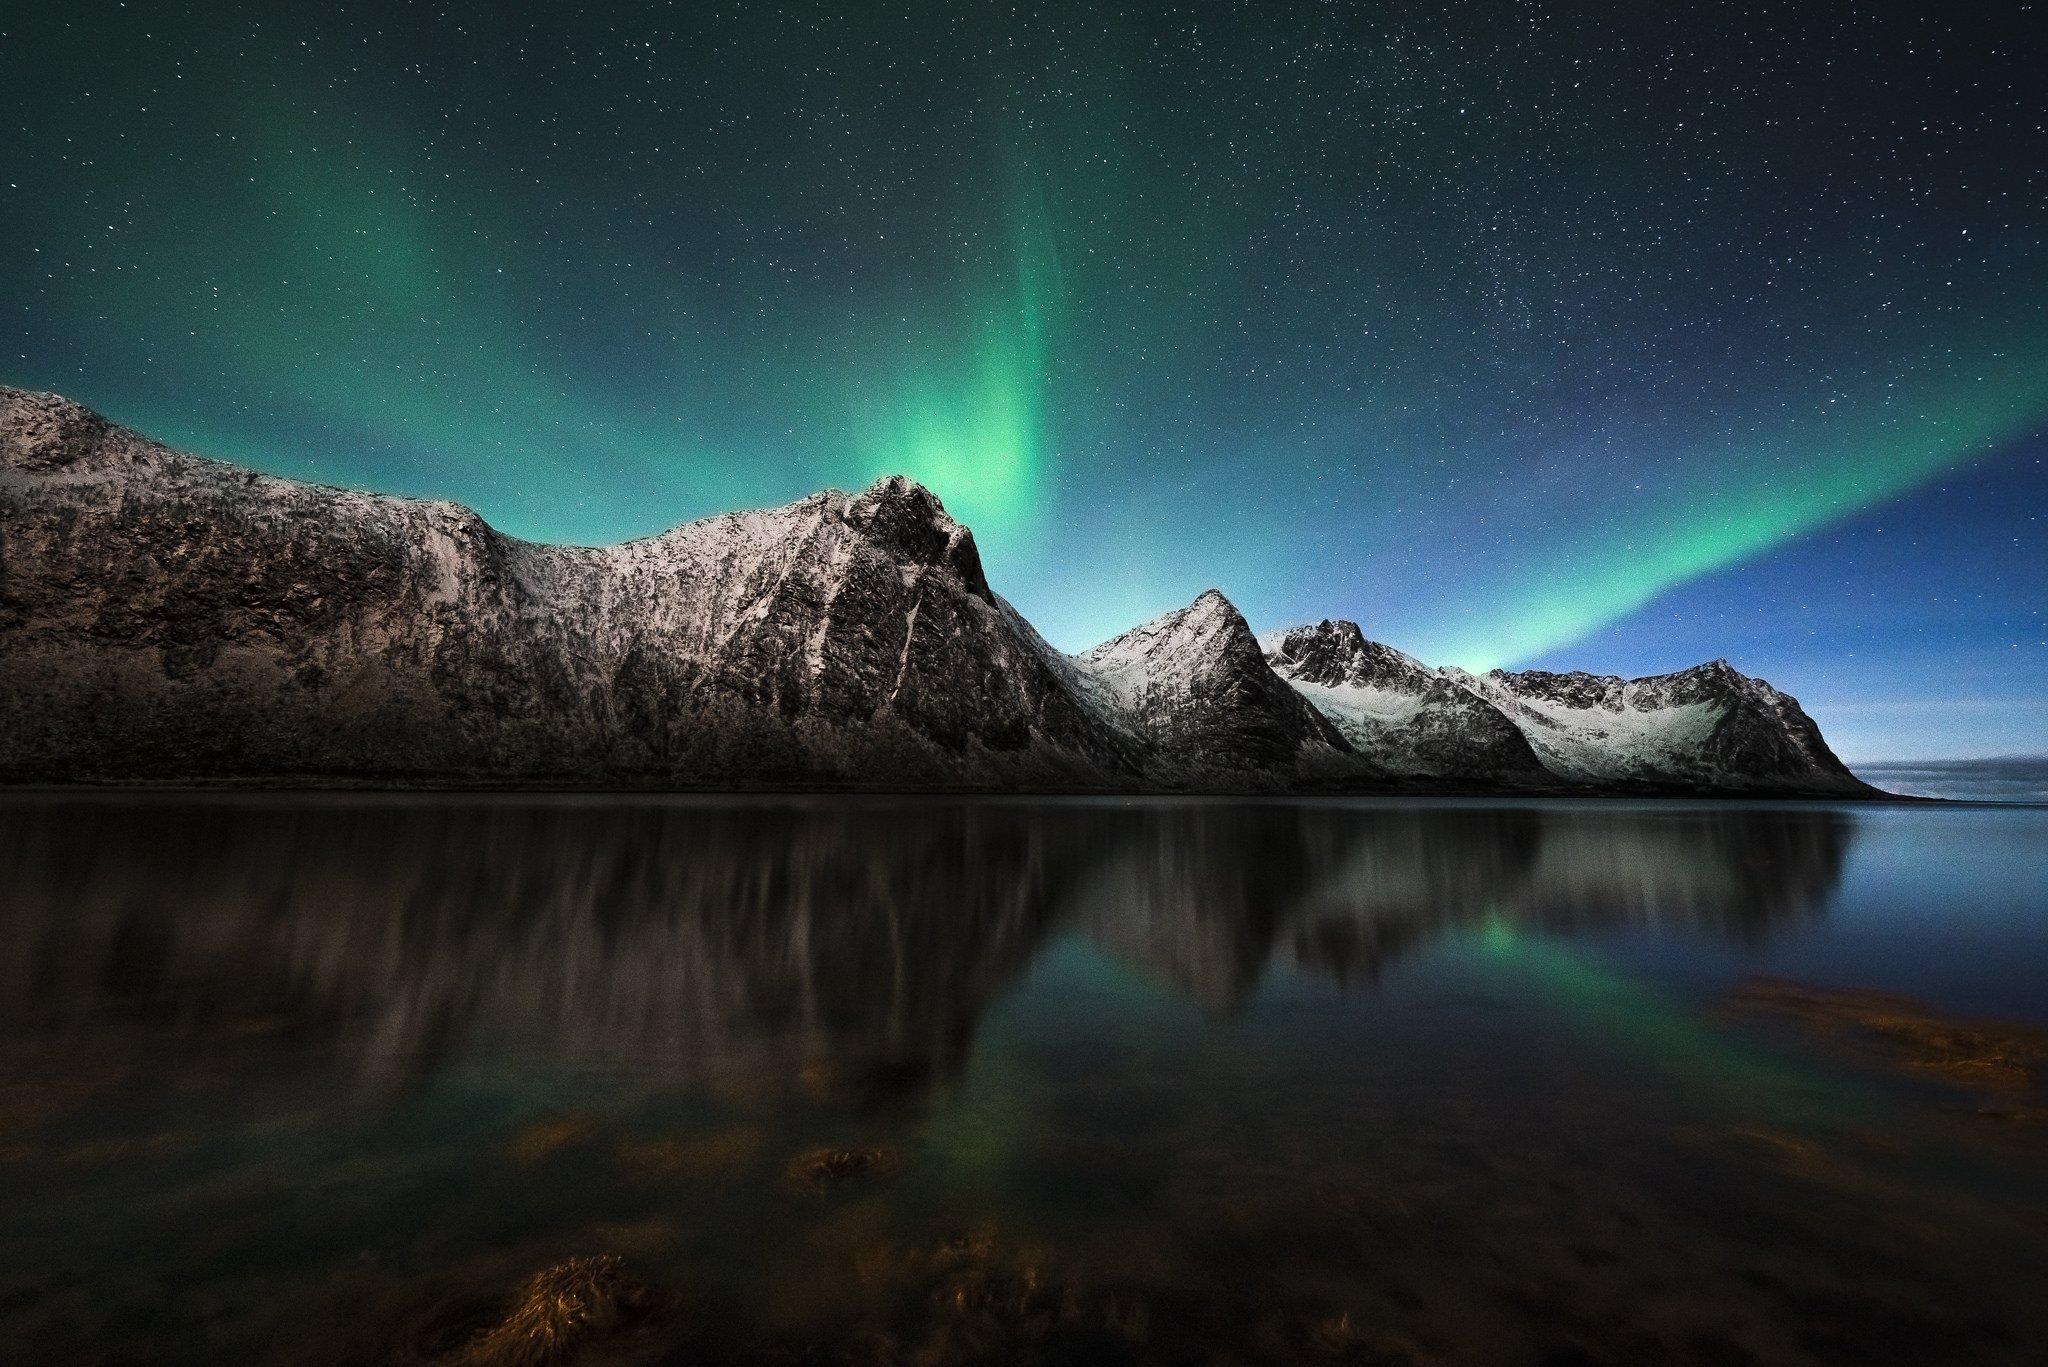 💚Nature's nightlight!💜 RT @fuggabugga @VladimerAntonov: #NorthernLights over Sážžá; Senja Island #Norway https://t.co/ycVi3aPq1M